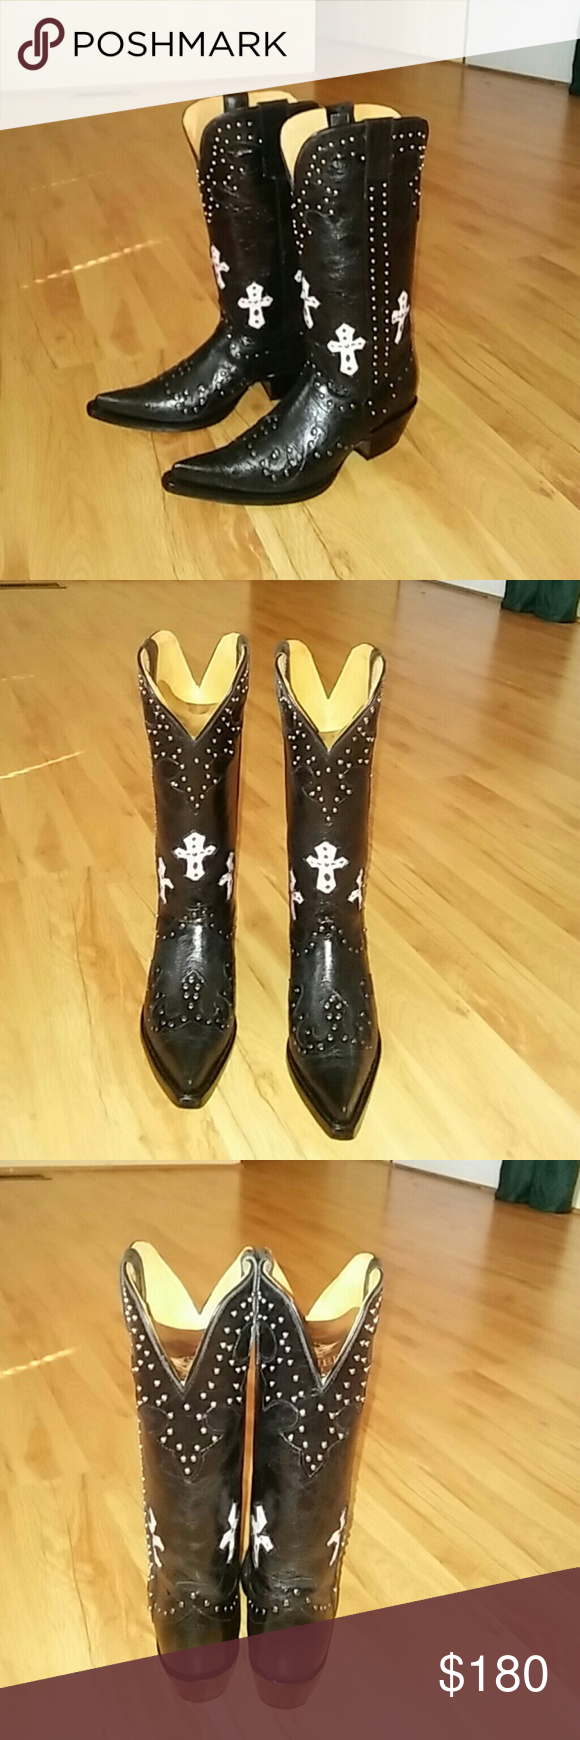 82b1bca510e74 Cowboy boots Brand new overralls black cowboy boots in their original box  Shoes